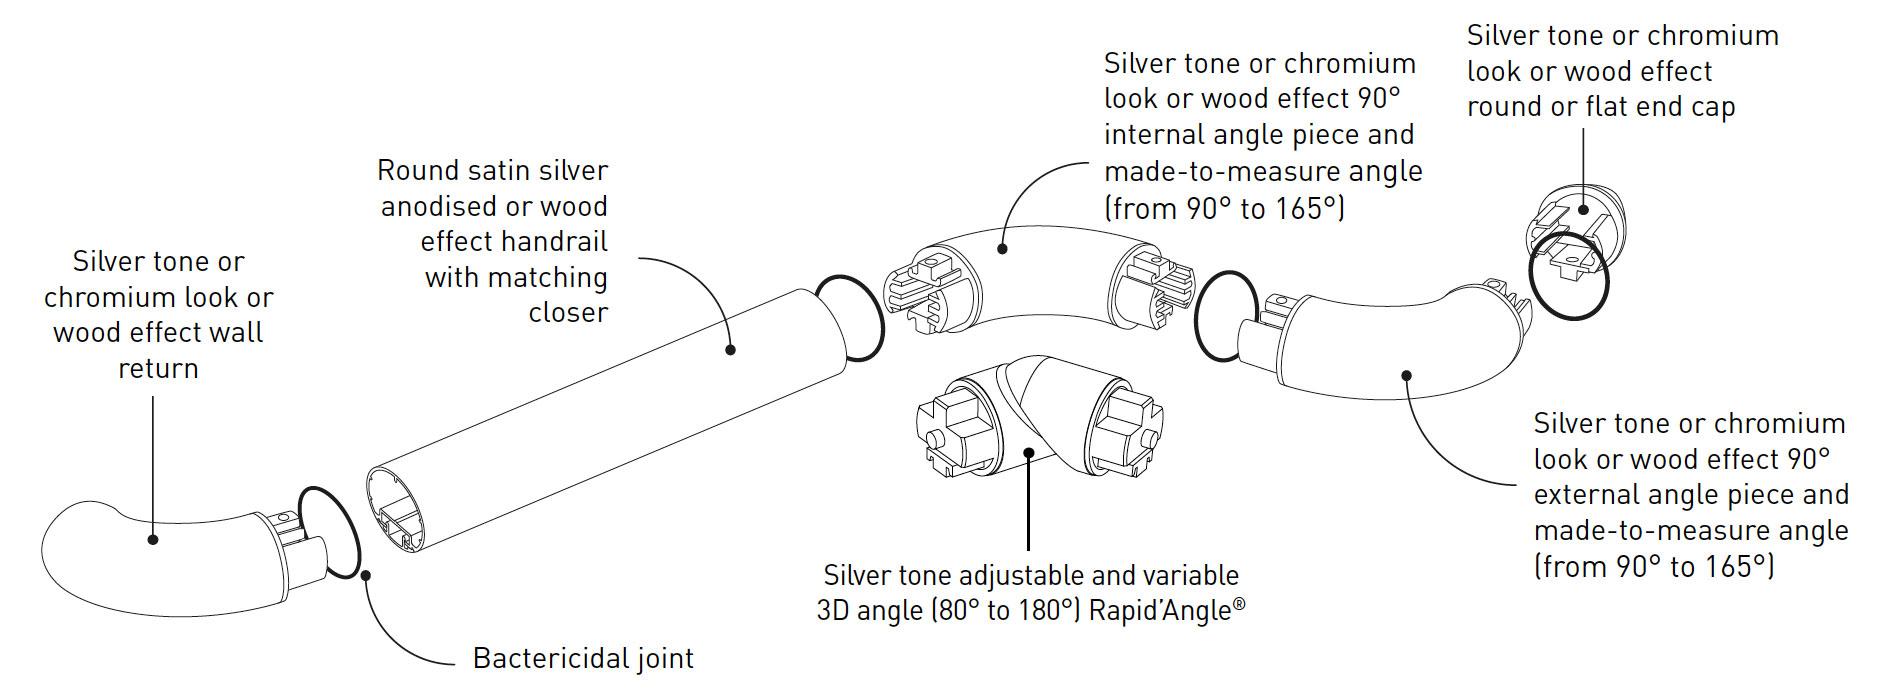 SPM Escort Decowood - Aluminium Leuning onderdelen tekening